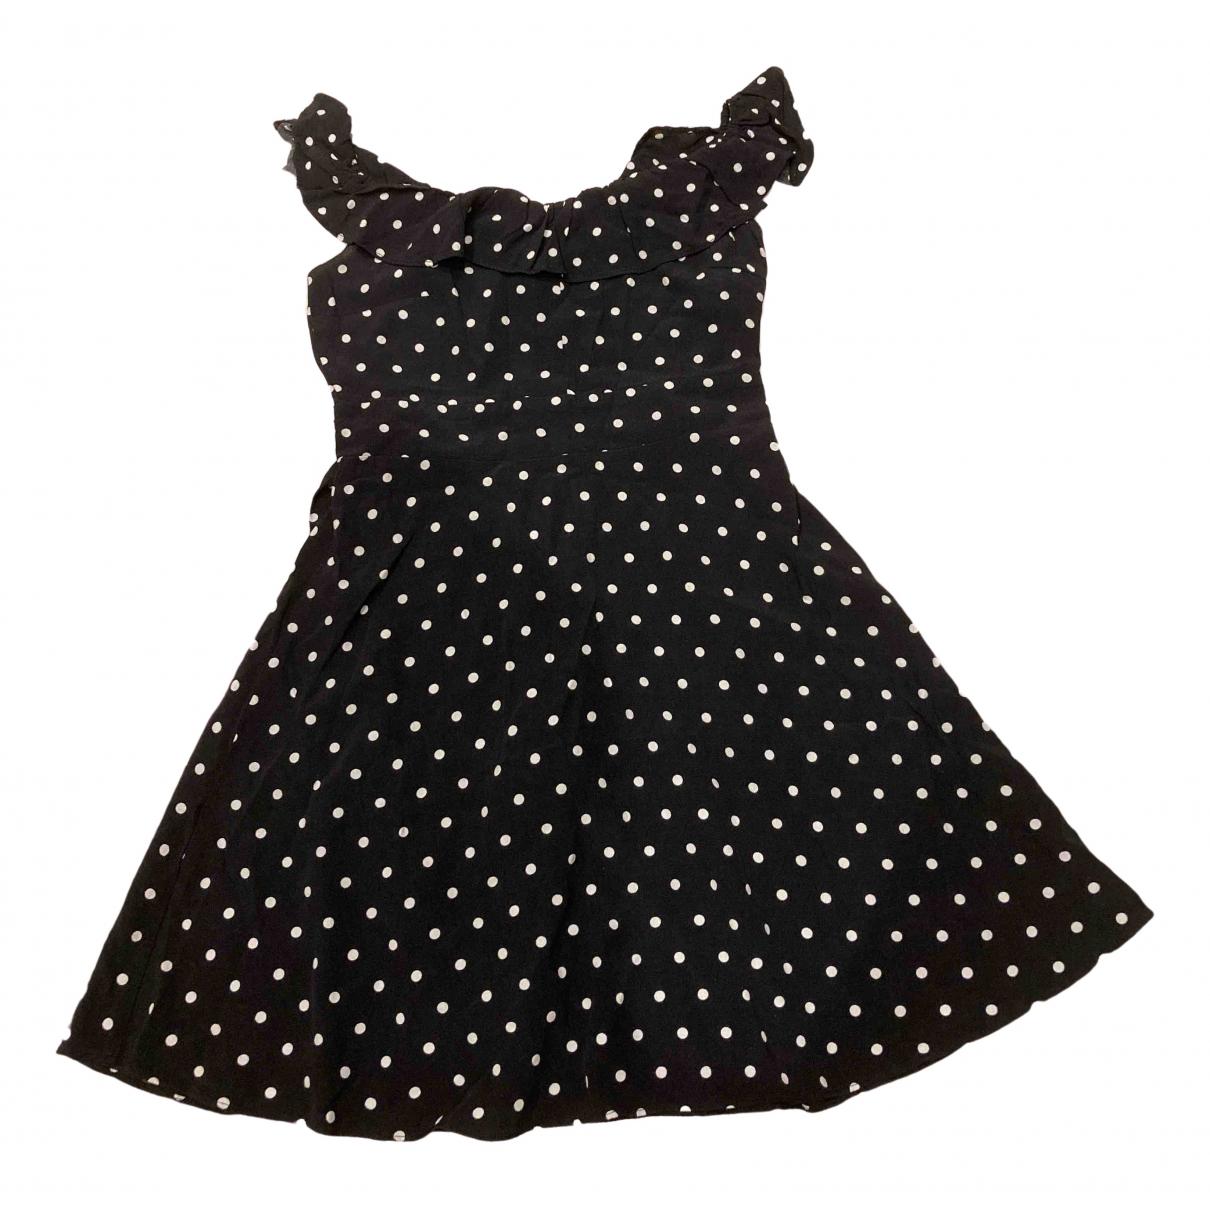 Zara \N Cotton dress for Women L International